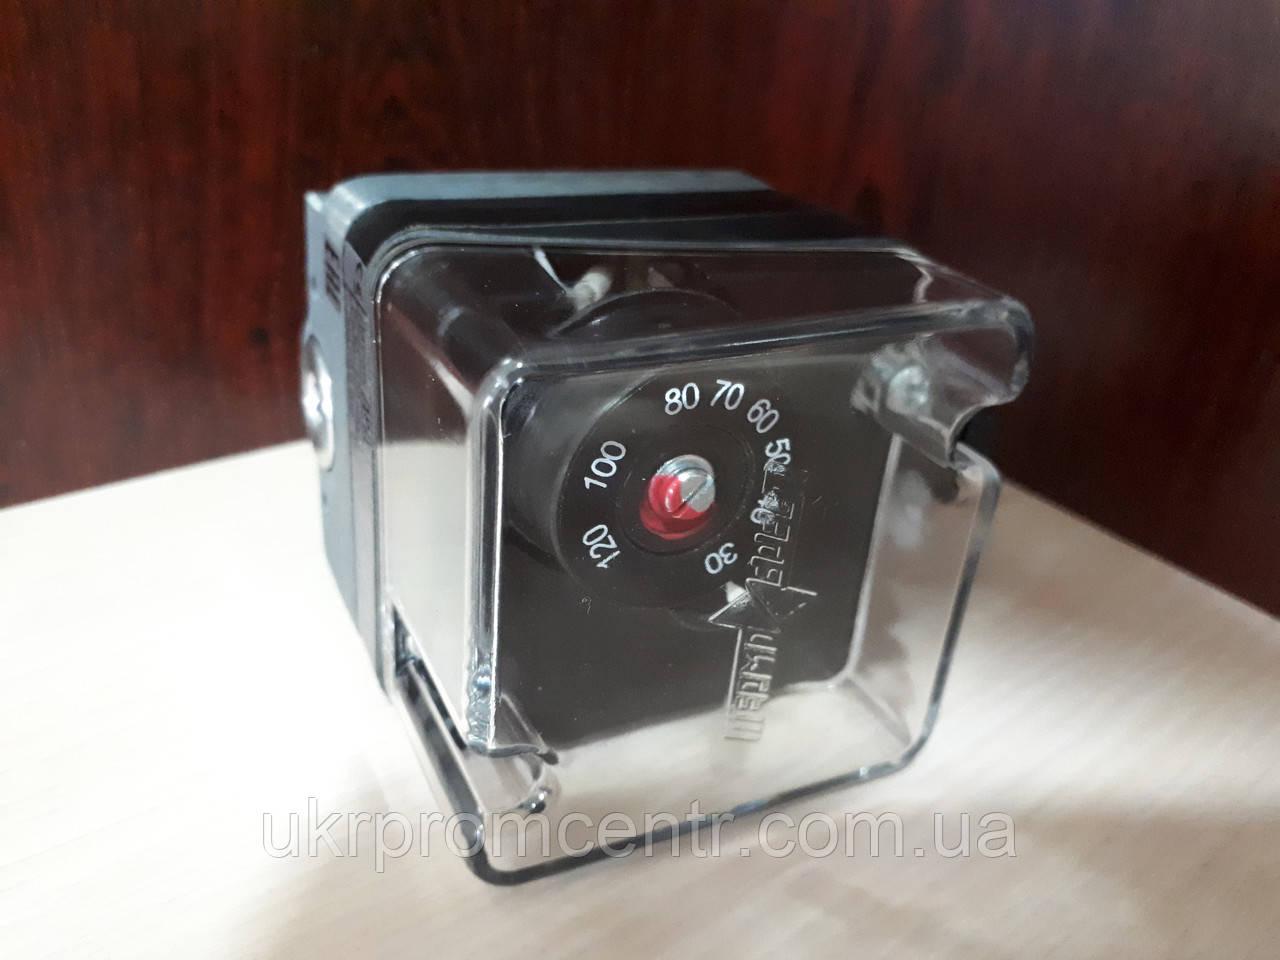 Датчик реле давления ДРД-120